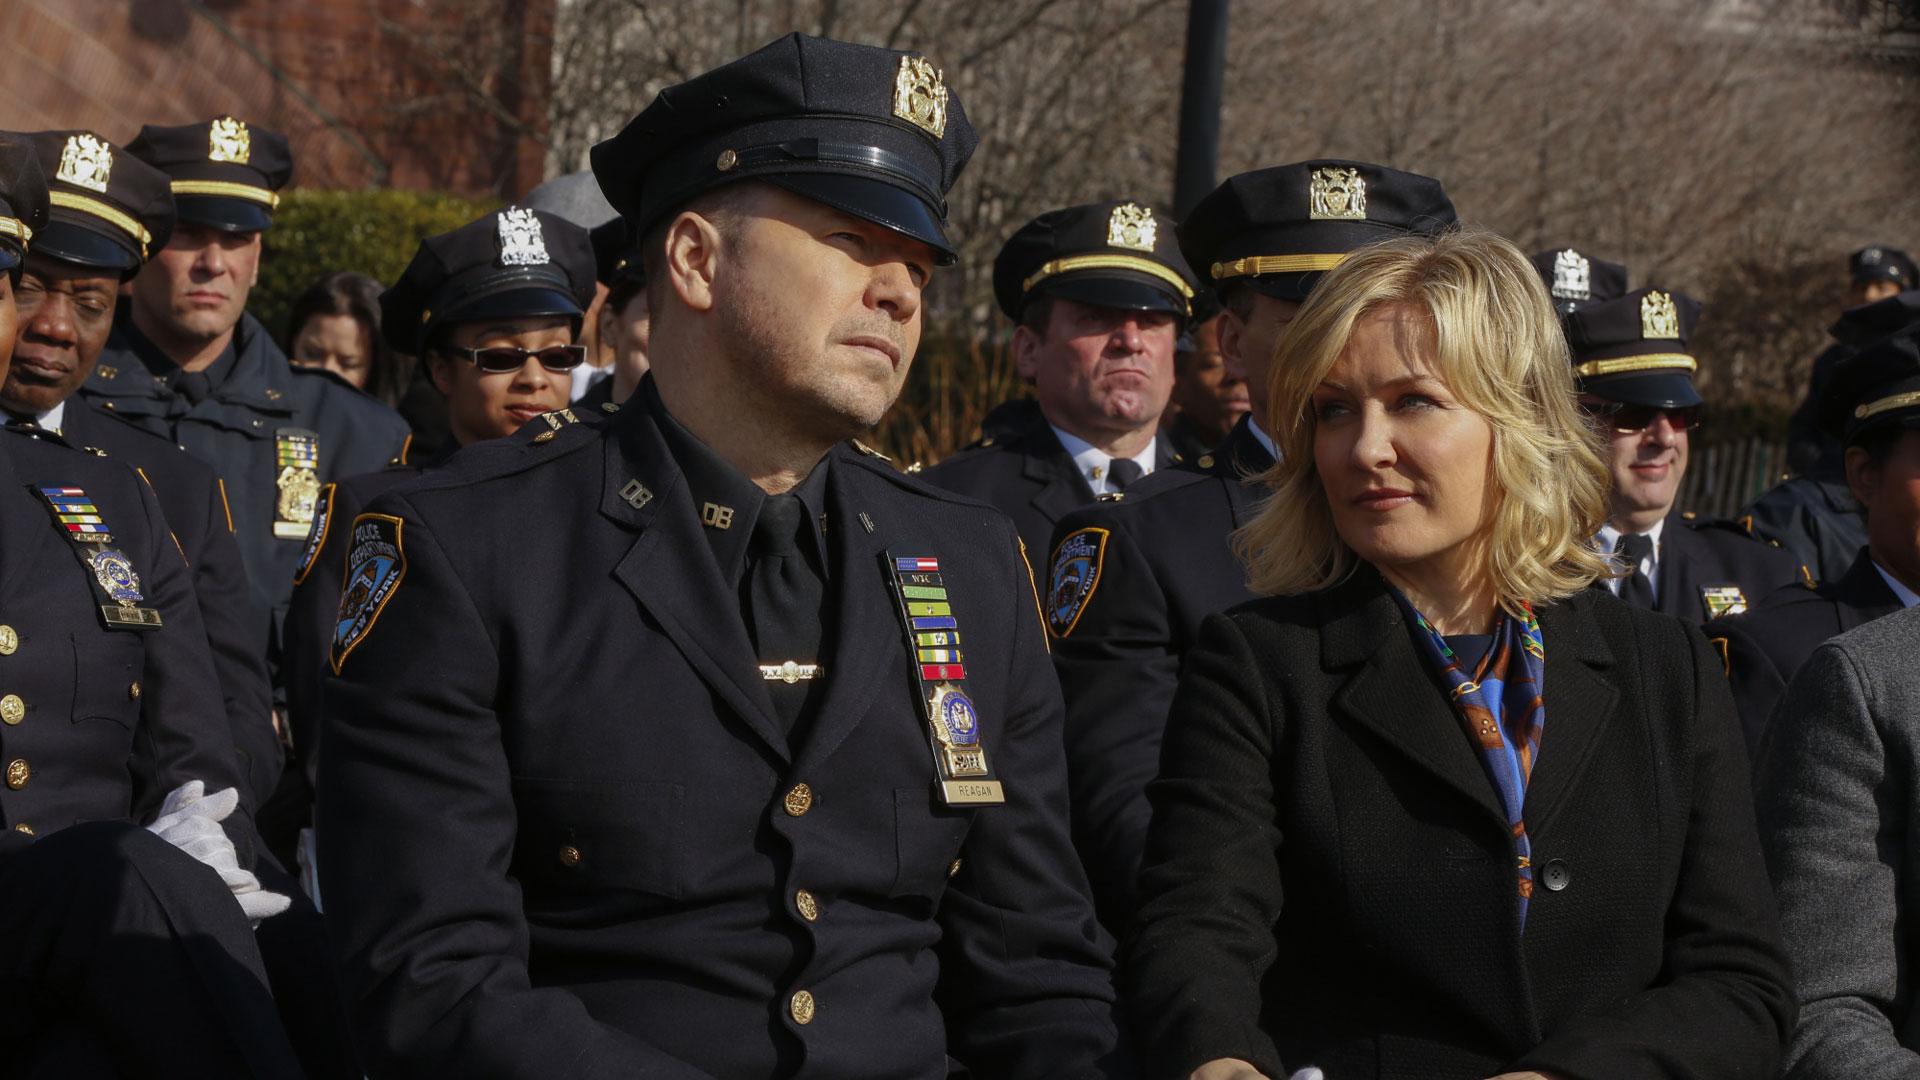 Linda Reagan joins Detective Danny Reagan at a ceremony.